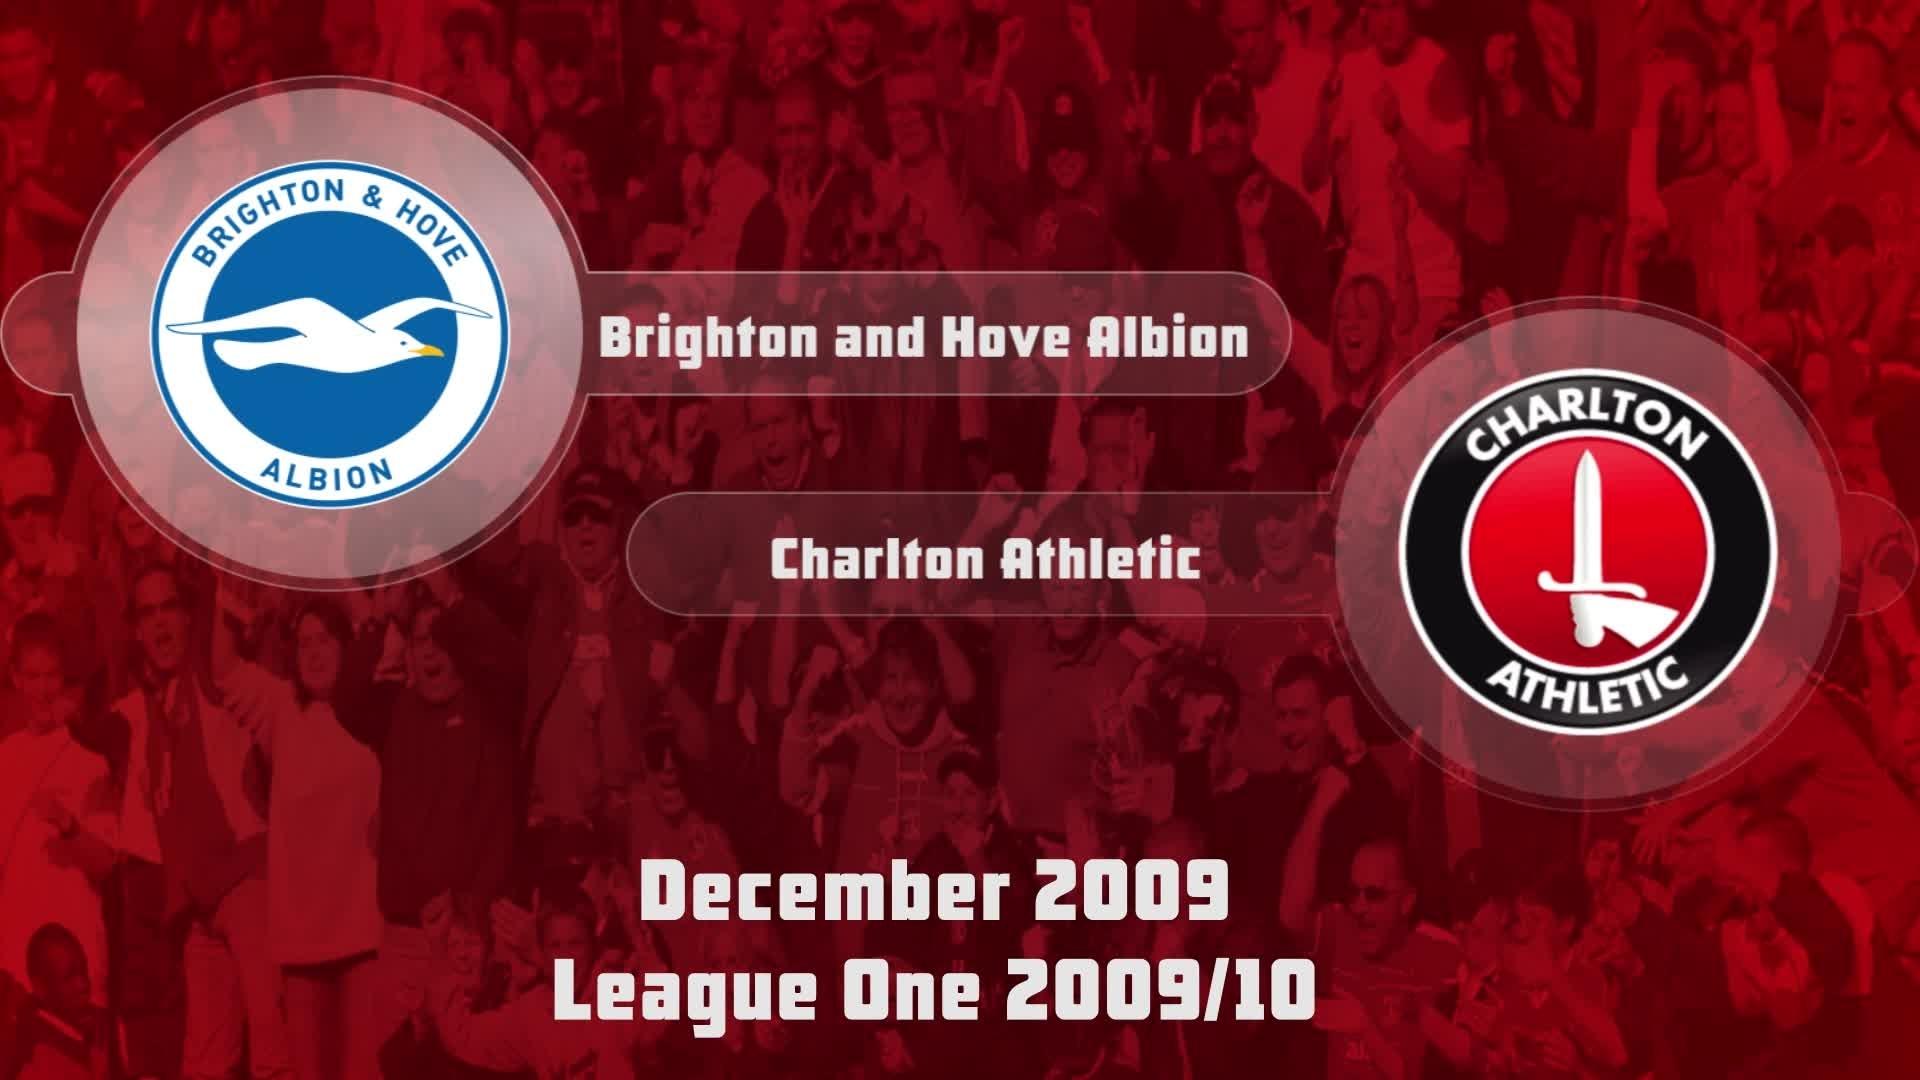 23 HIGHLIGHTS | Brighton and Hove 0 Charlton 2 (Dec 2009)